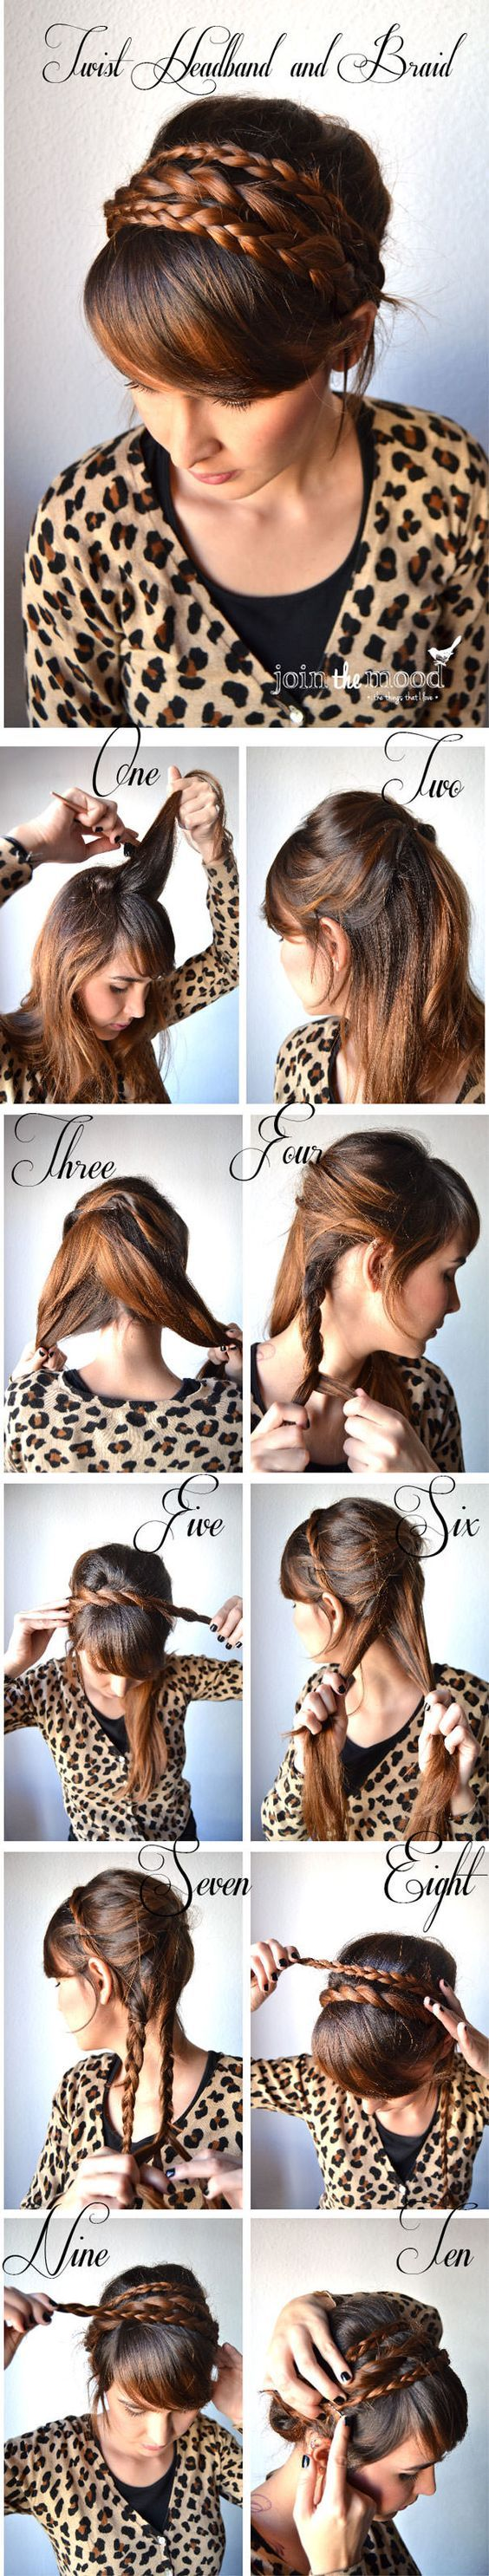 #braided #headband #tutorial #DIY #braids #hair #longhair #hairdo #hairstyle #romantic